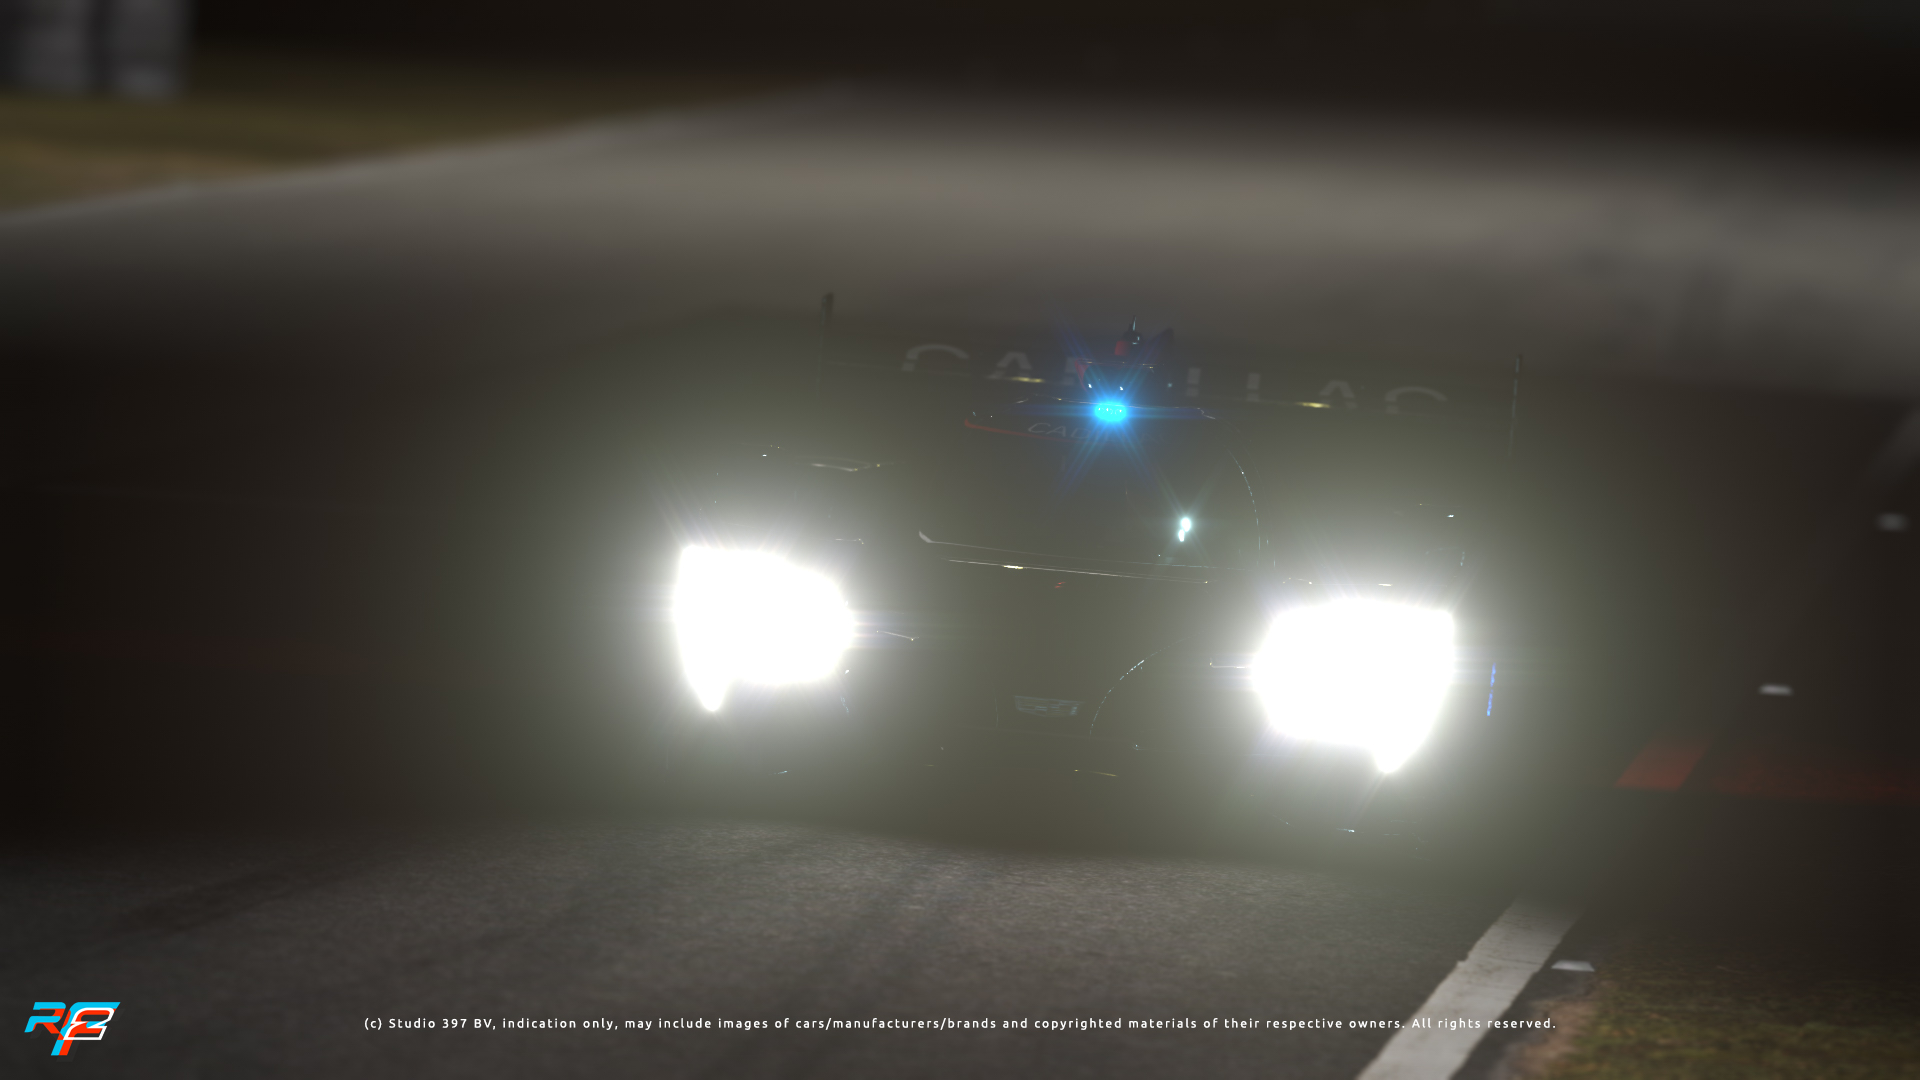 Cadillac_DPi_2020_01 (1).jpg